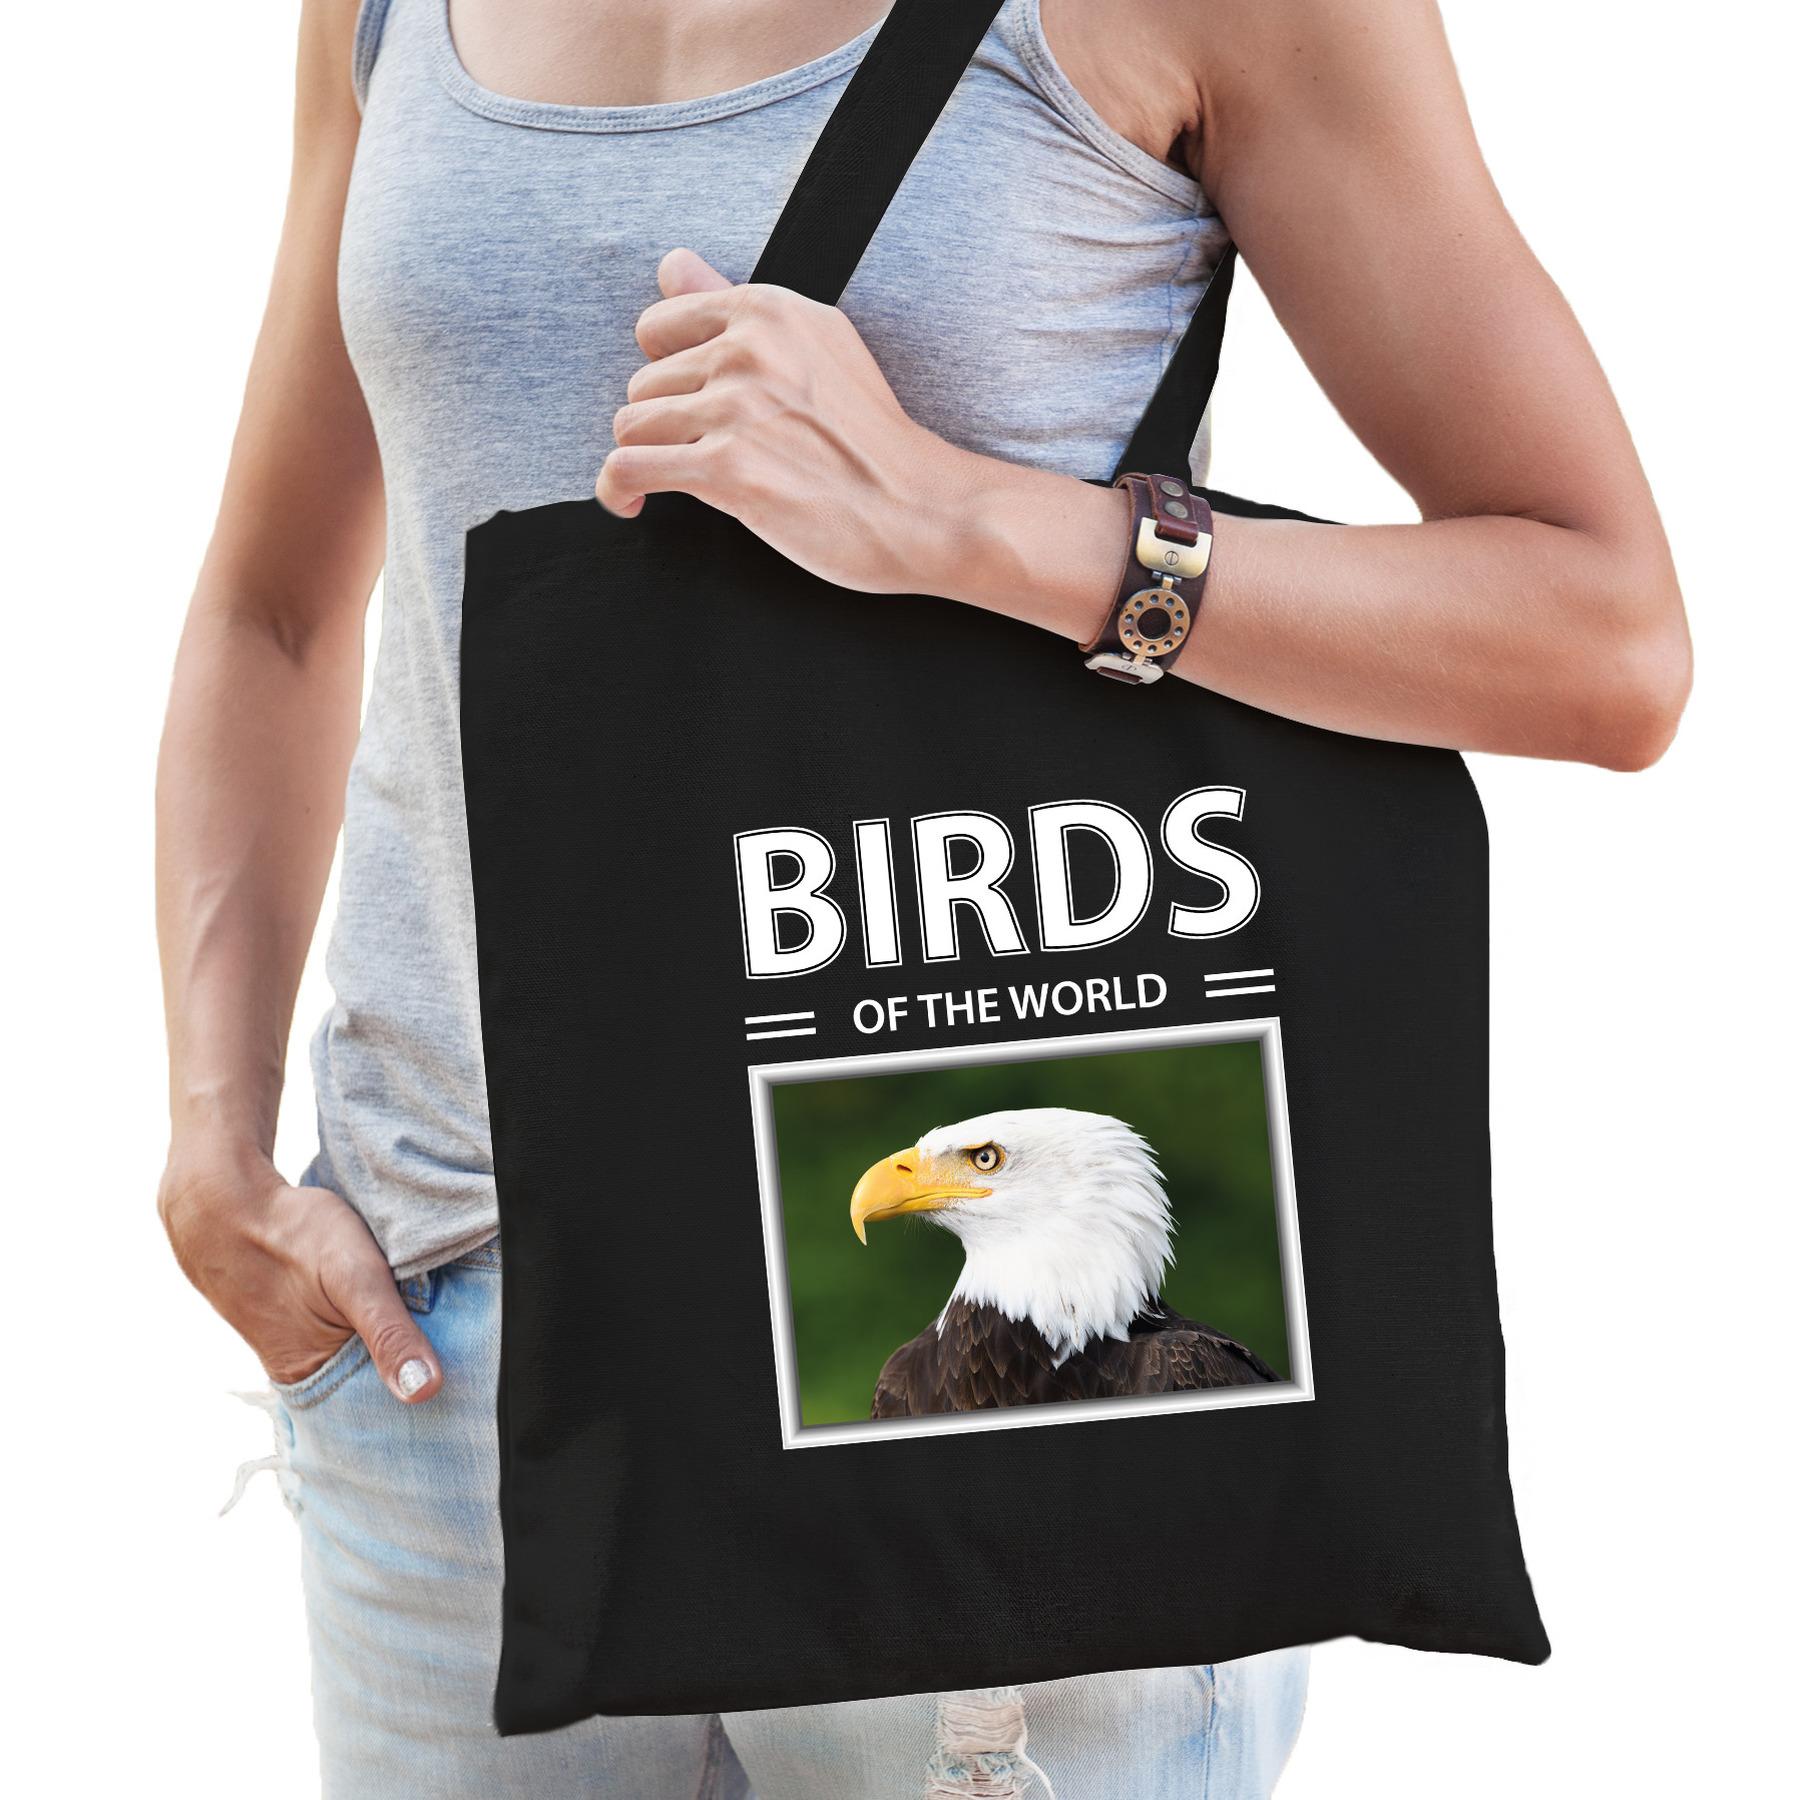 Katoenen tasje Amerikaanse zeearenden zwart - birds of the world Amerikaanse zeearend cadeau tas